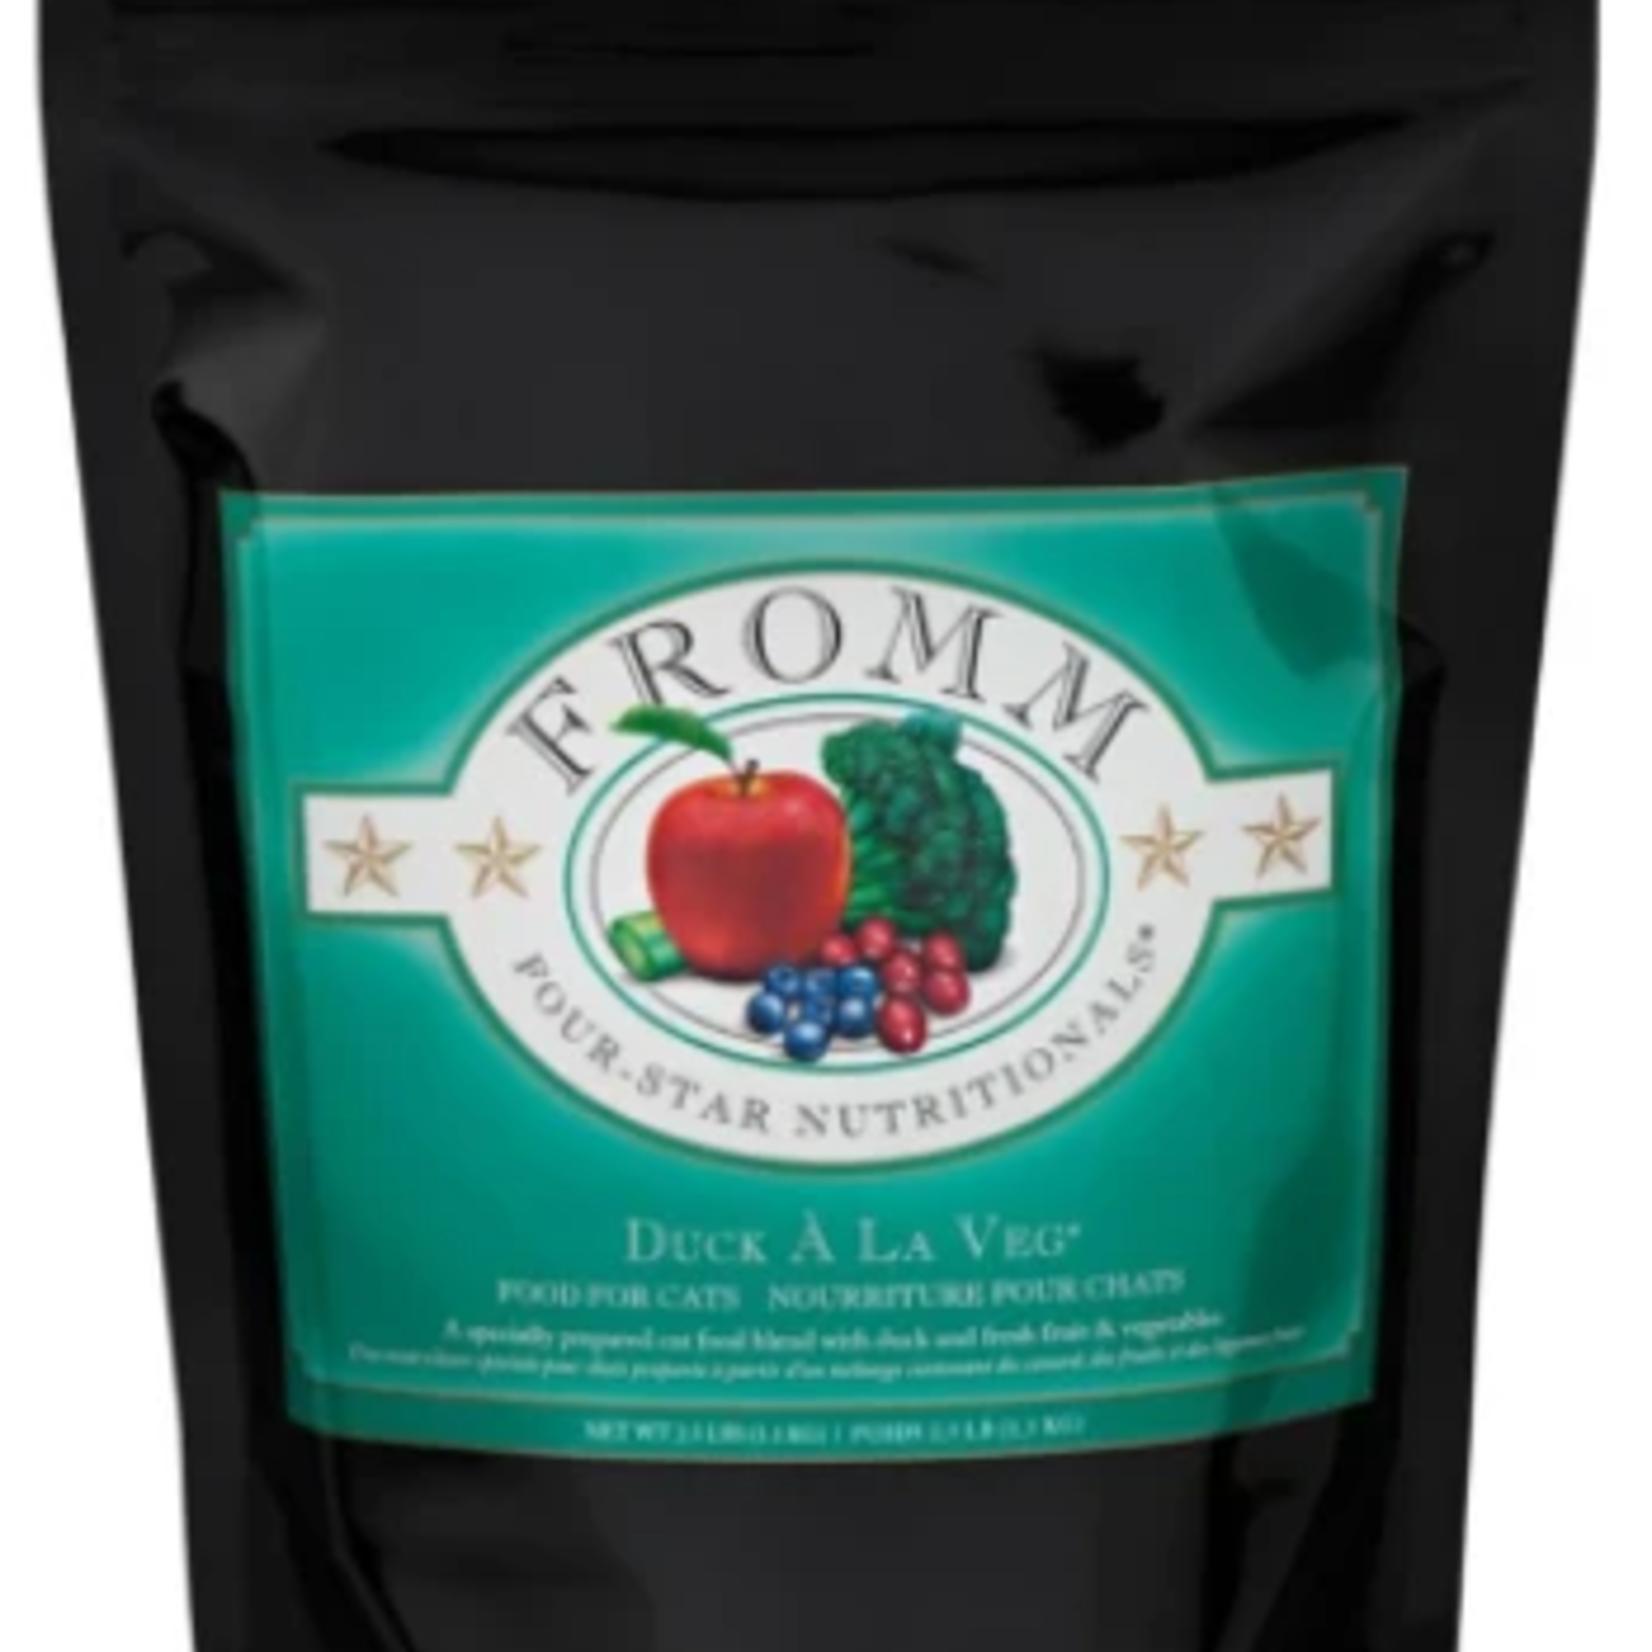 Fromm Duck À La Veg® Recipe - dry cat food